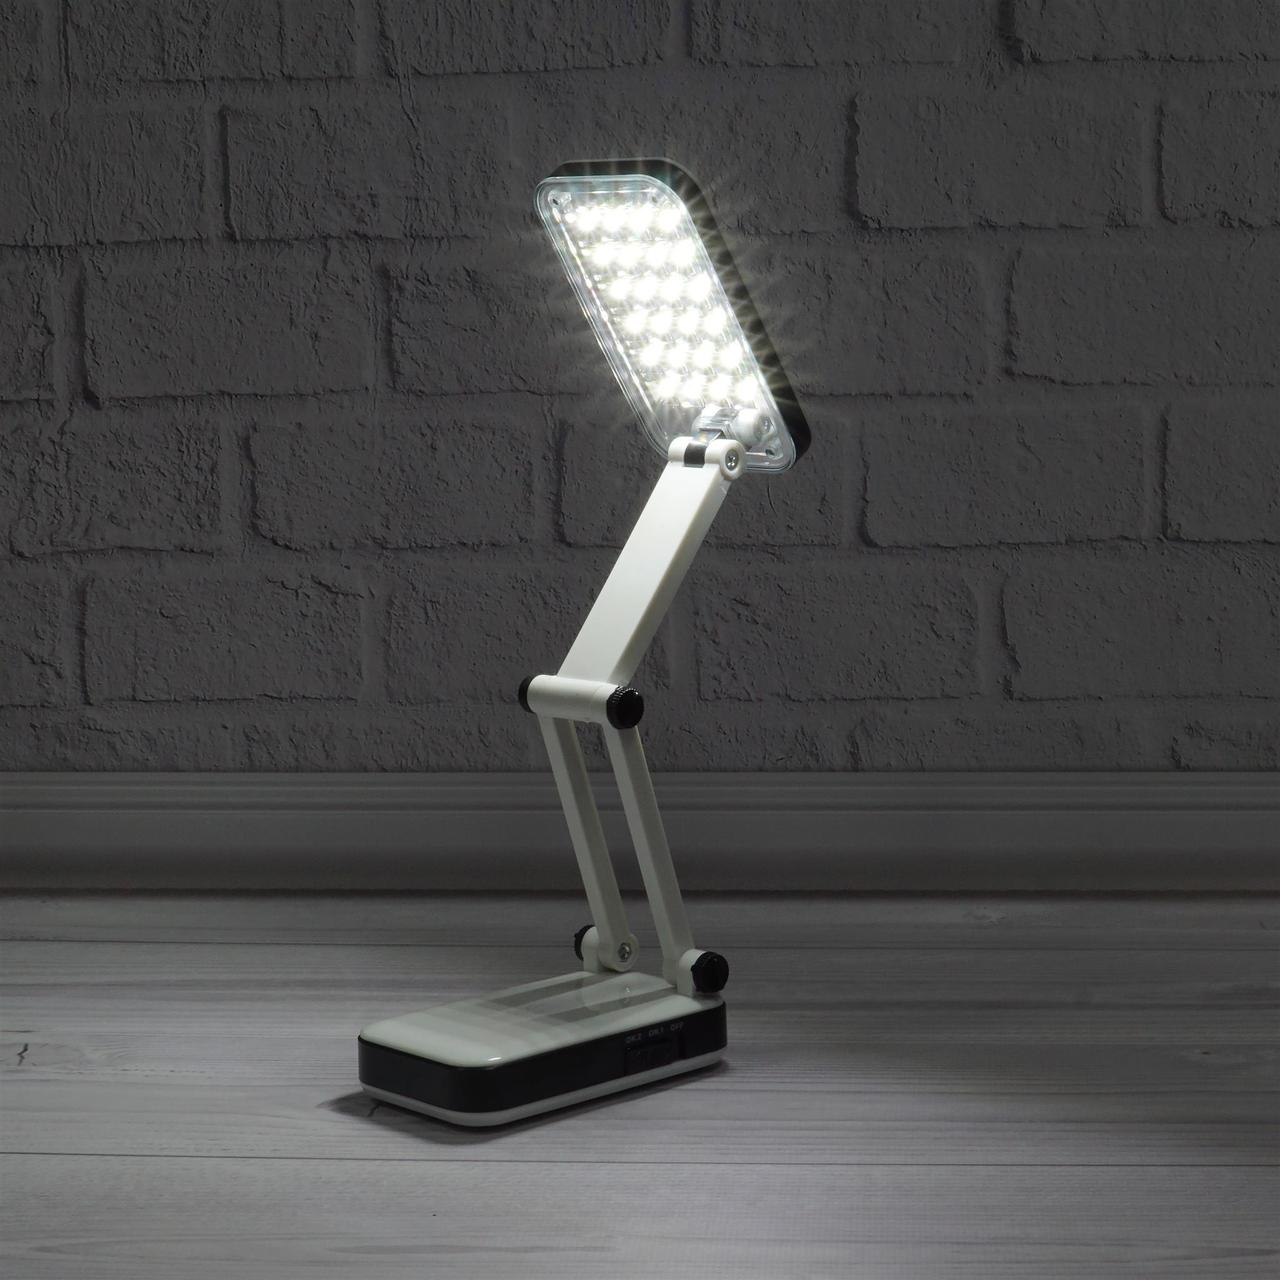 Настольная лампа трансформер 24 LED с аккумулятором - фото 7